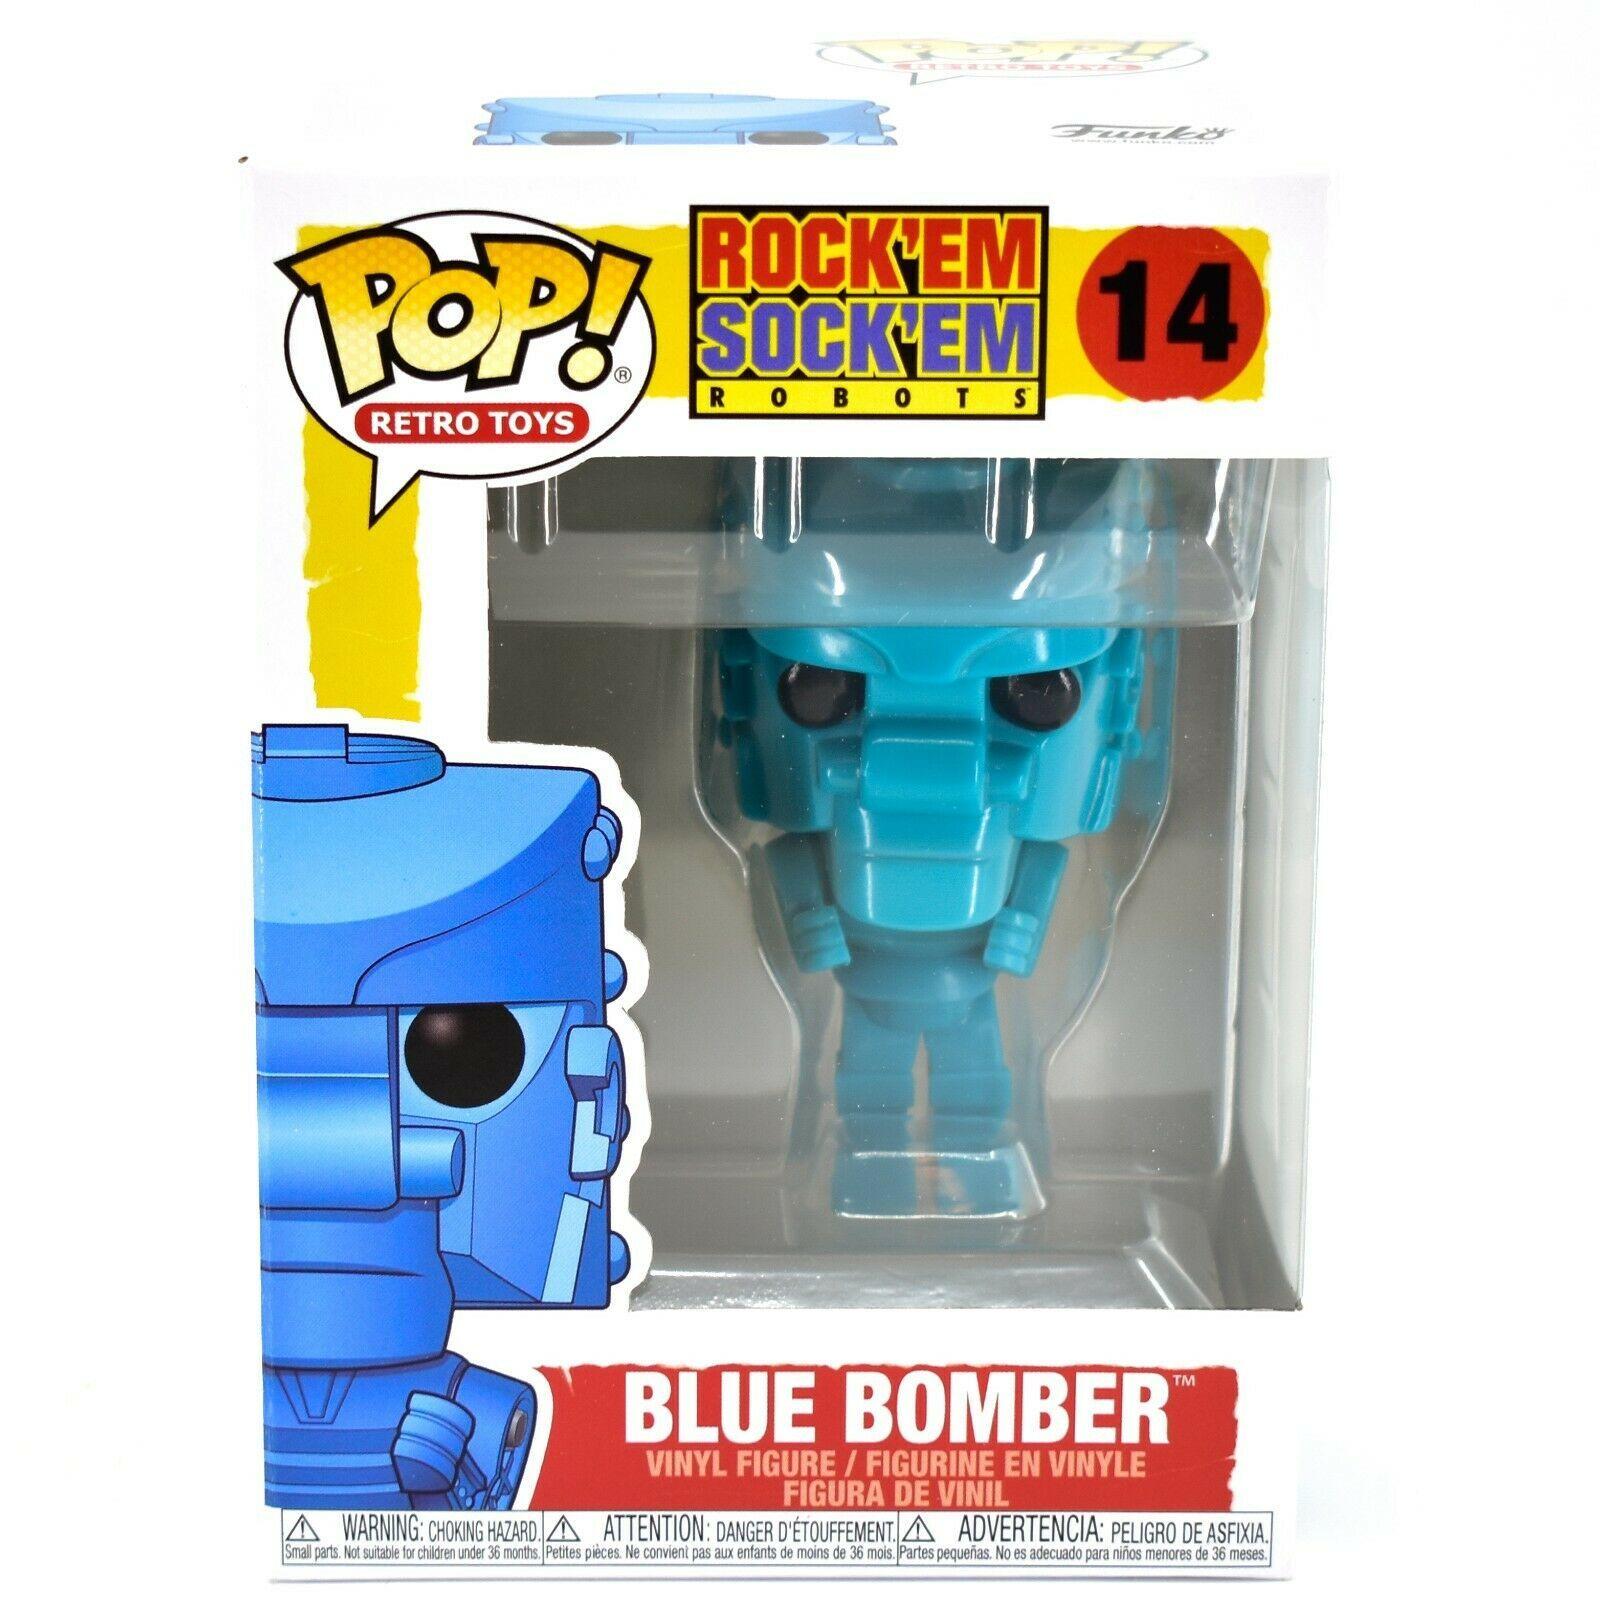 Funko Pop! Retro Toys Rock'em Sock'em Blue Bomber #14 Vinyl Figure